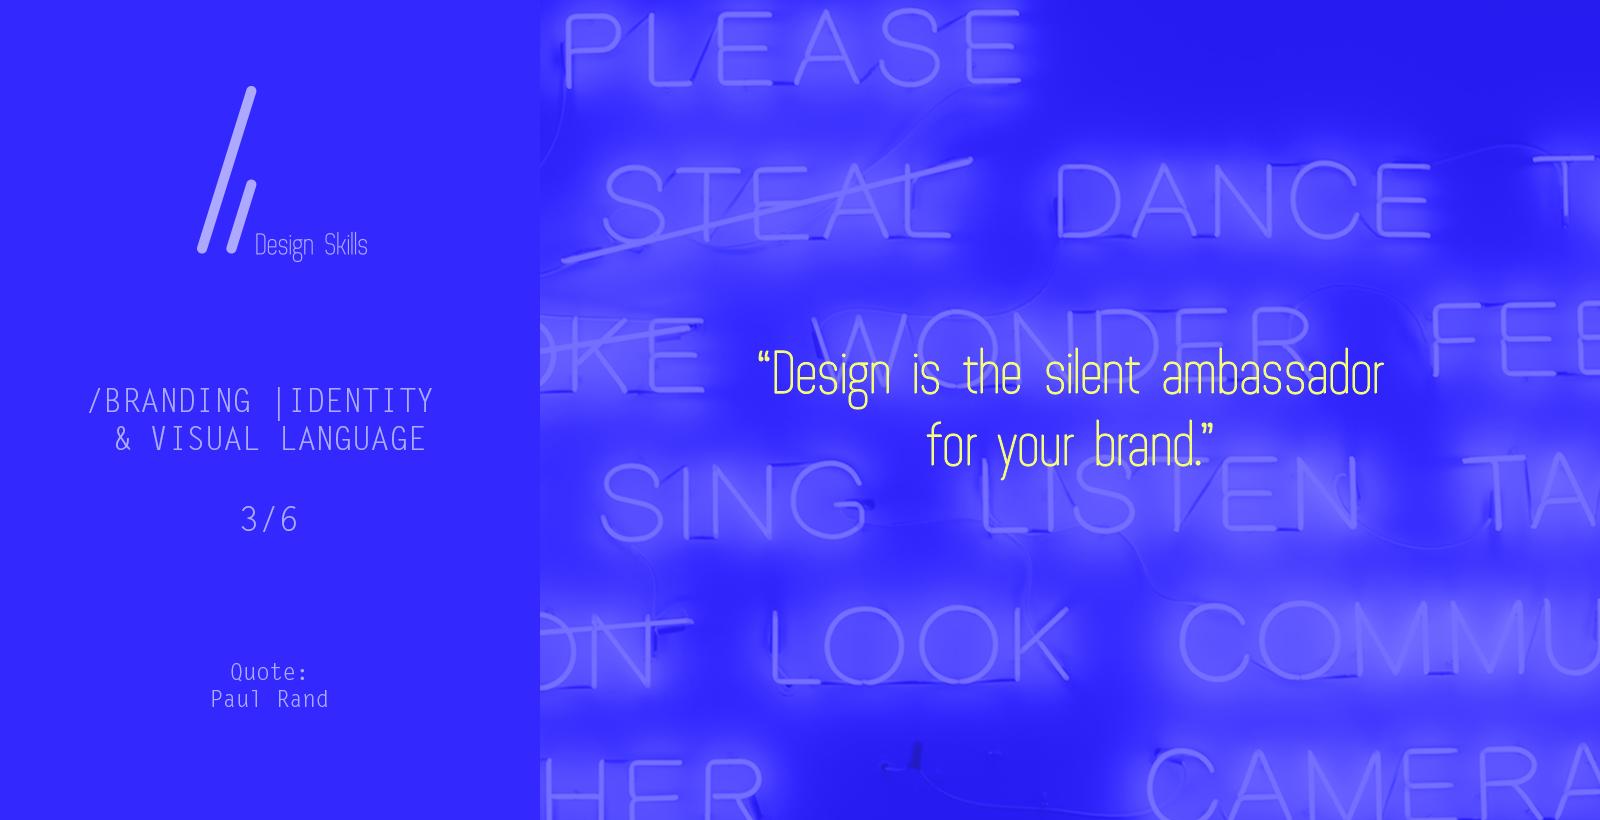 Design skills: branding, identity and visual language.